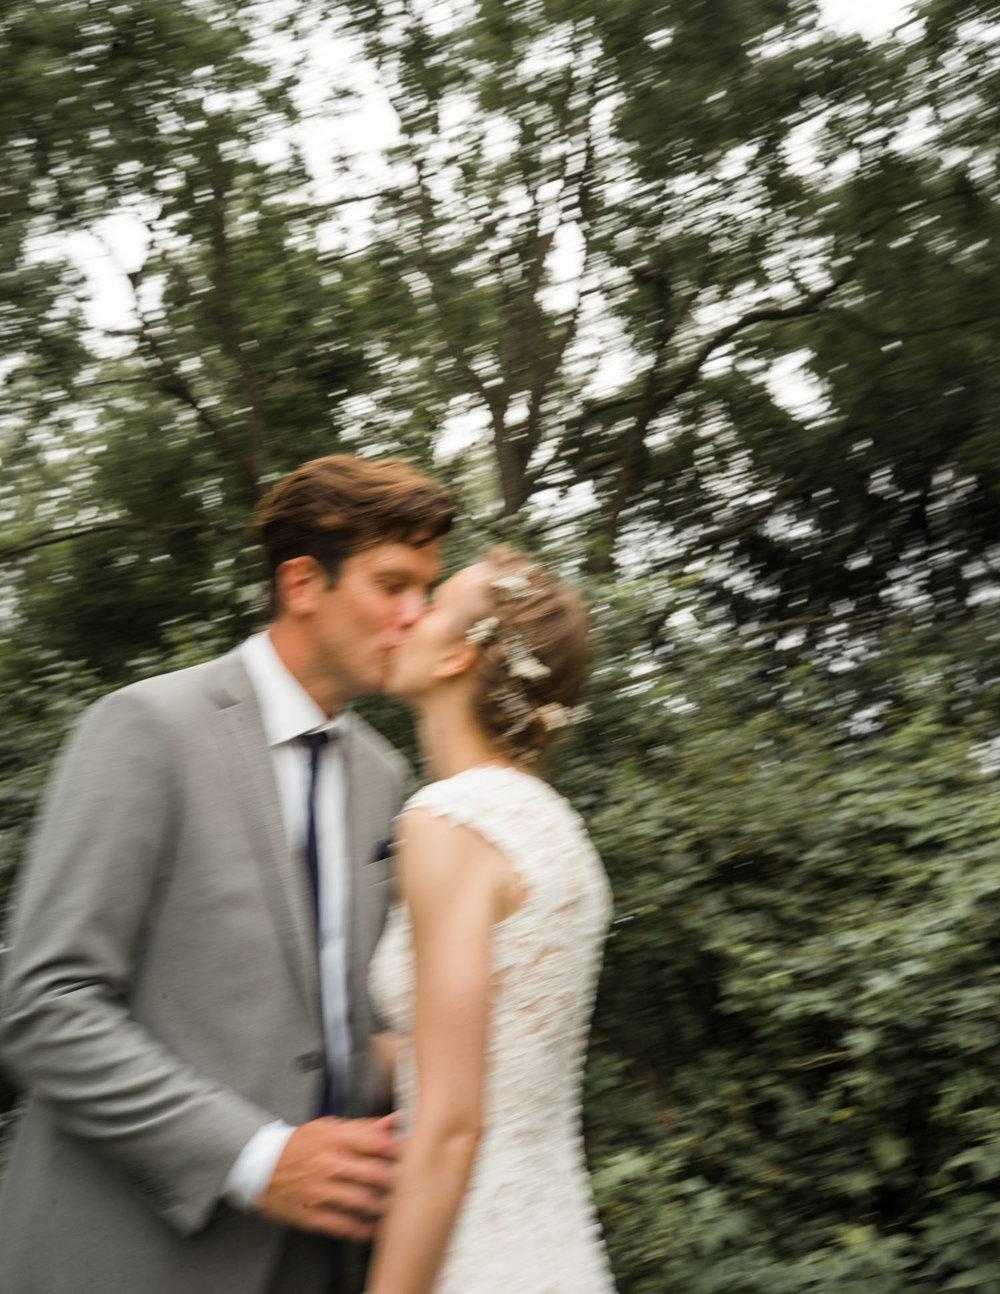 couple kissing-2.jpg